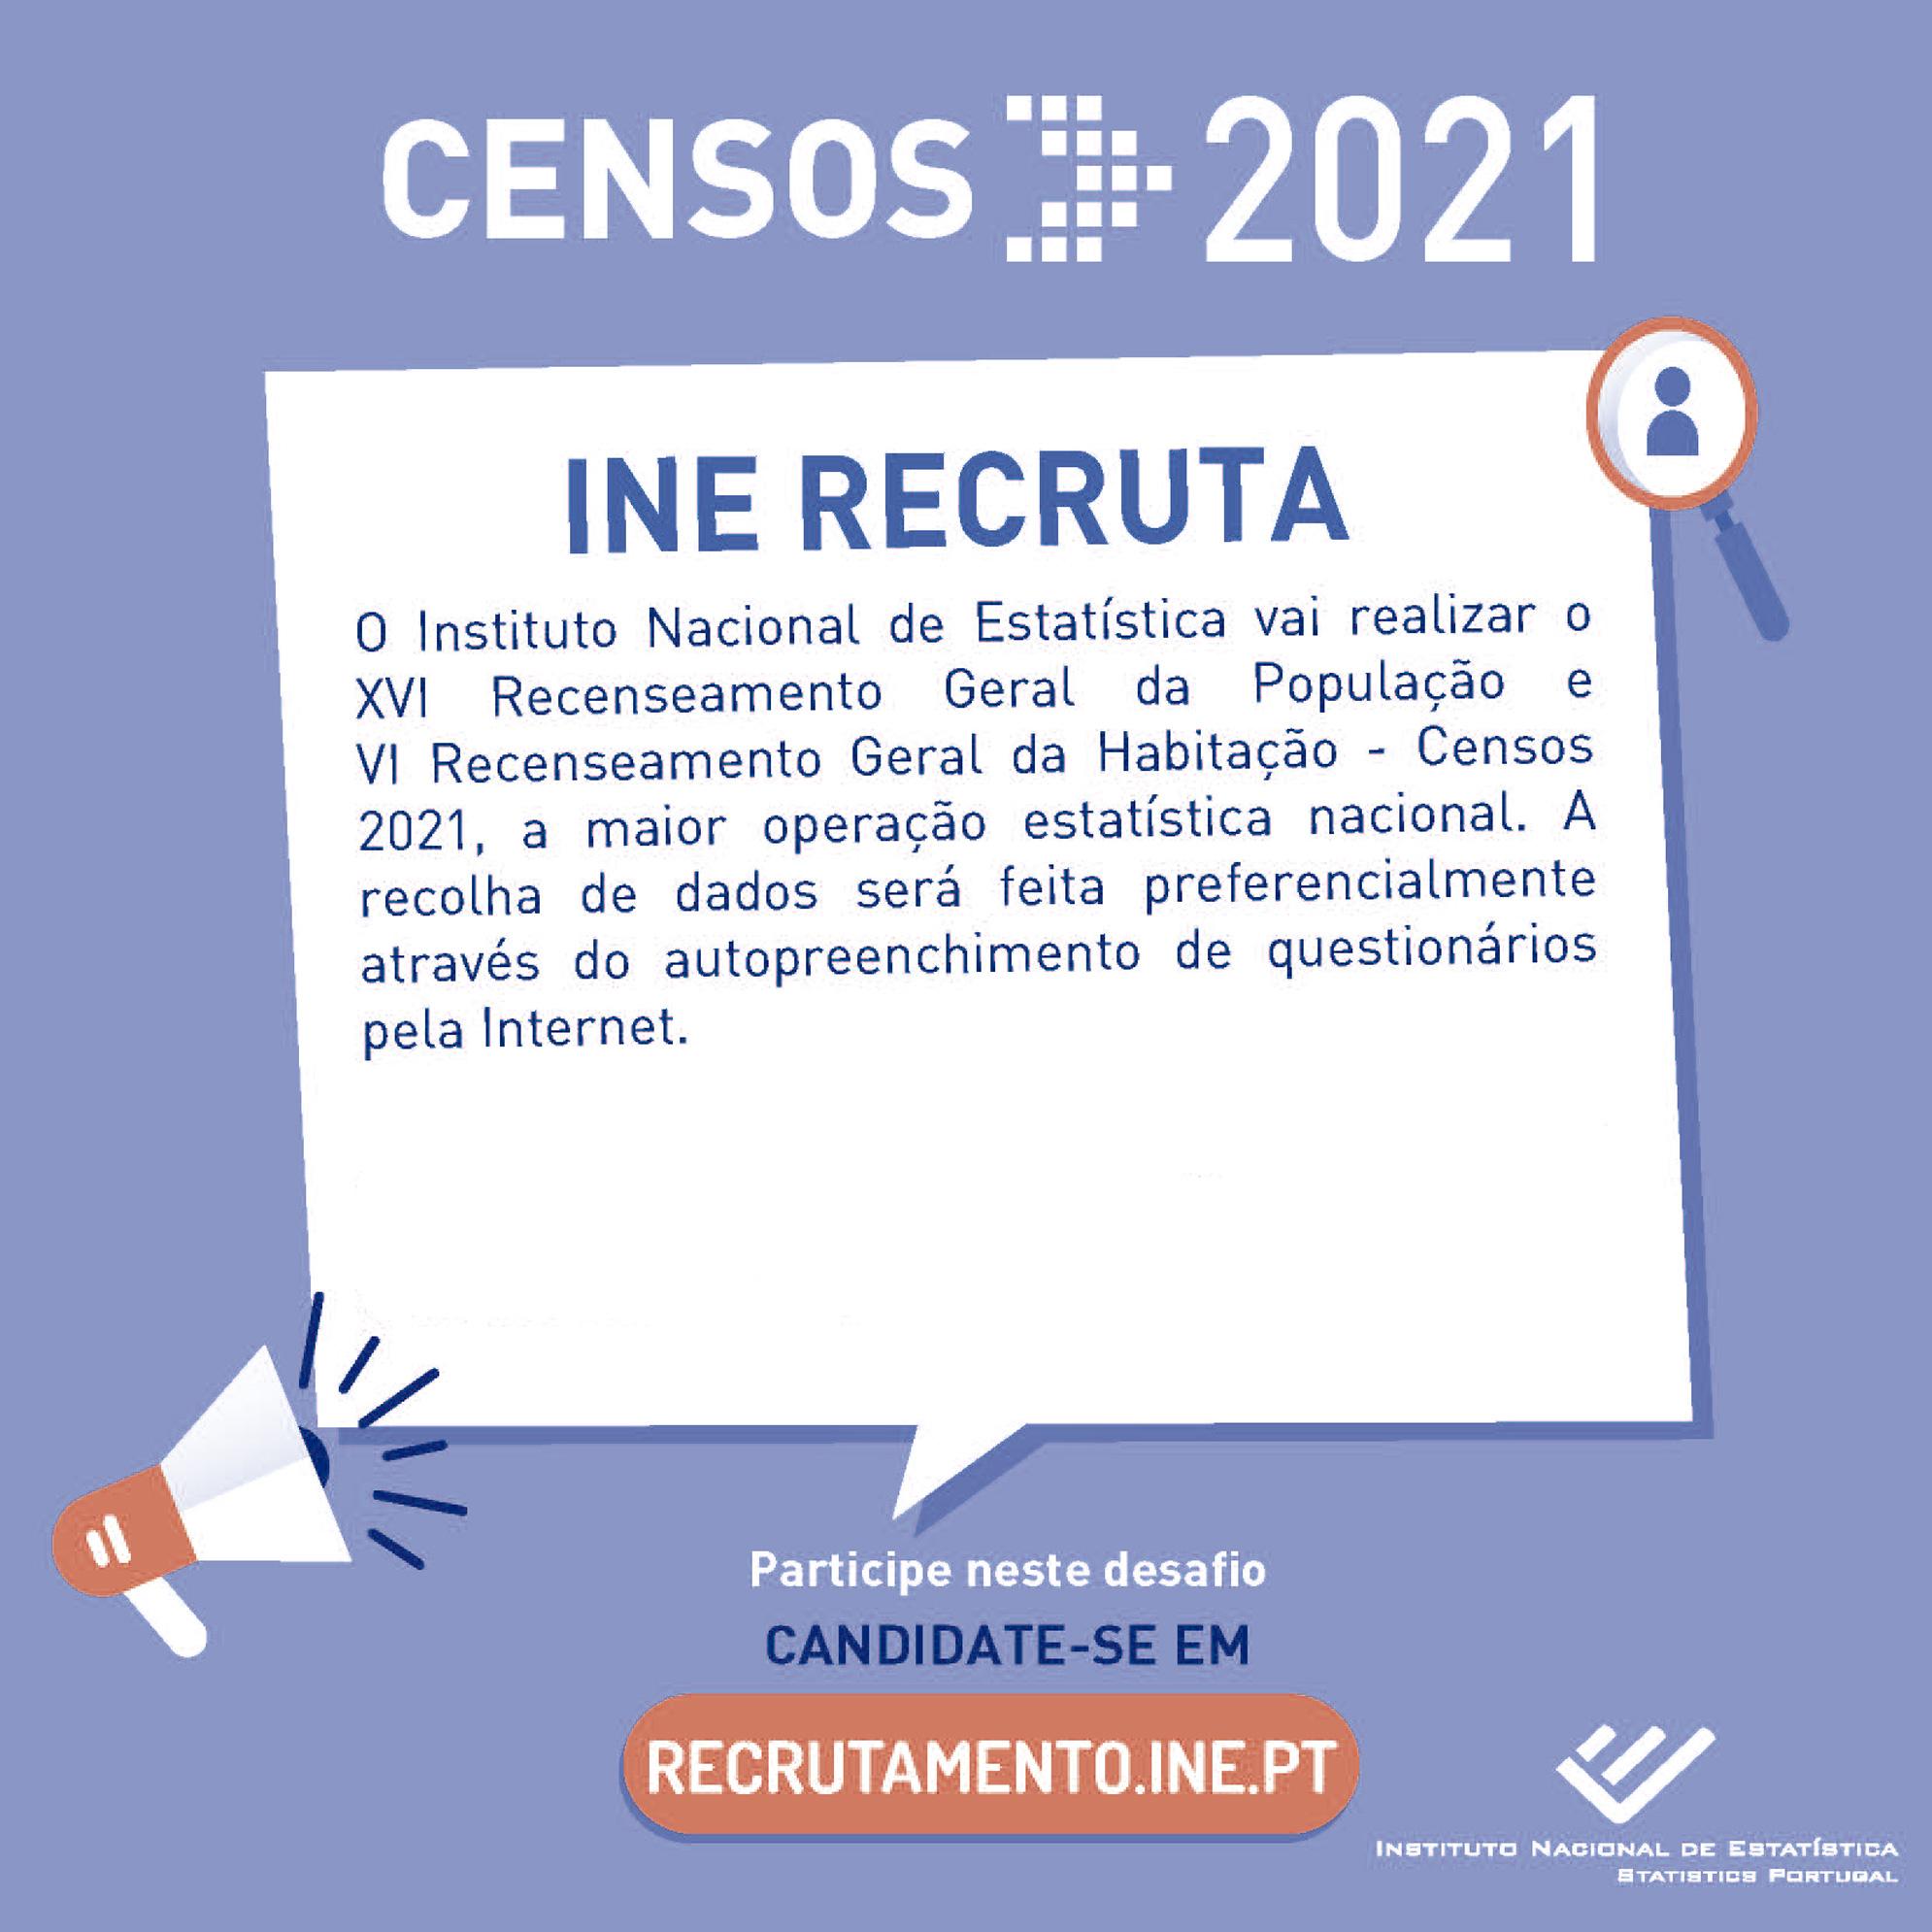 INSTITUTO NACIONAL DE ESTATÍSTICA – RECRUTAMENTO CENSOS 2021